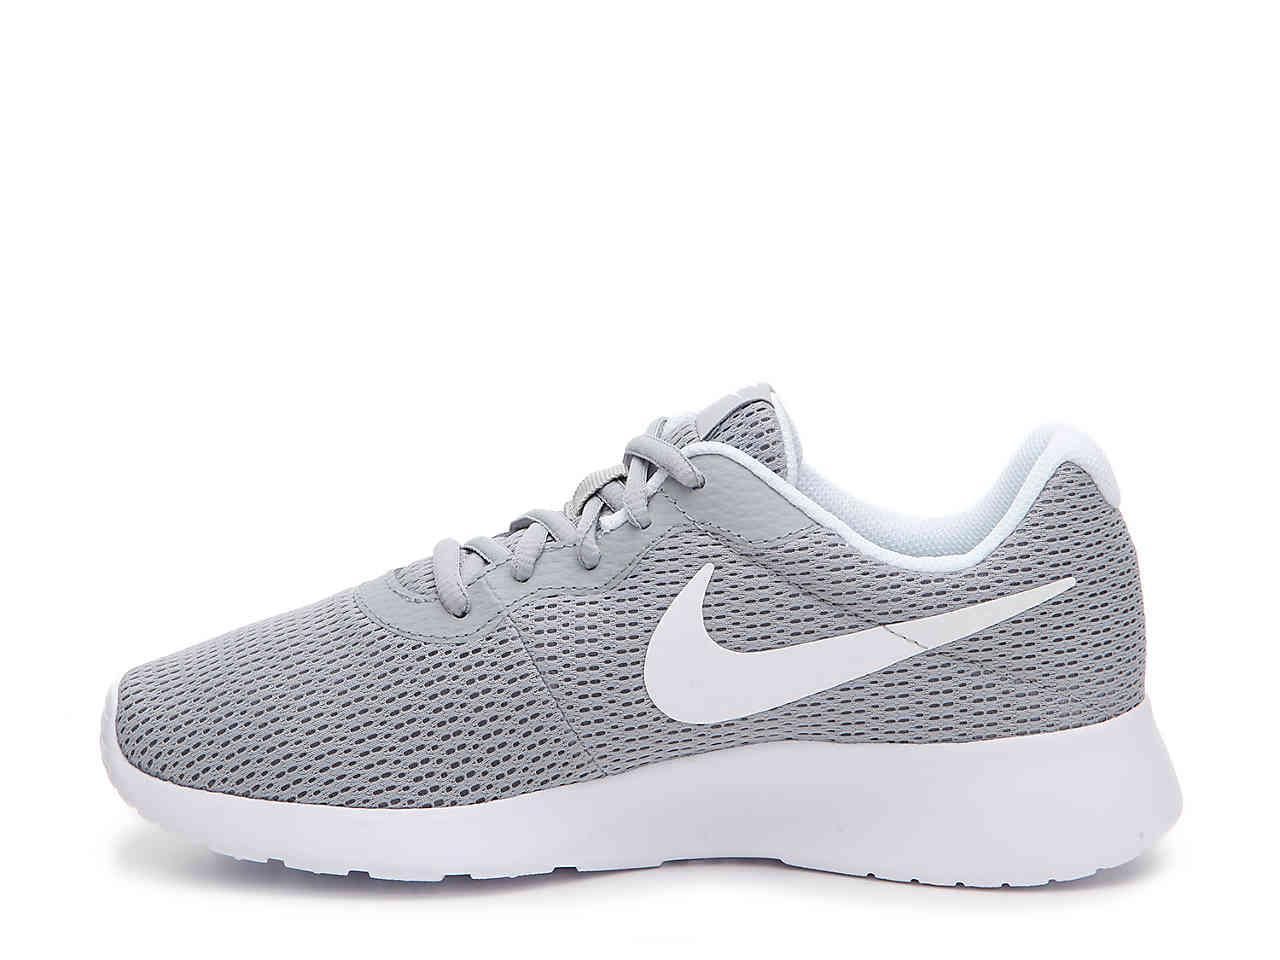 ... spain lyst nike tanjun sneaker in gray 2d03e 1549c e04e5b916